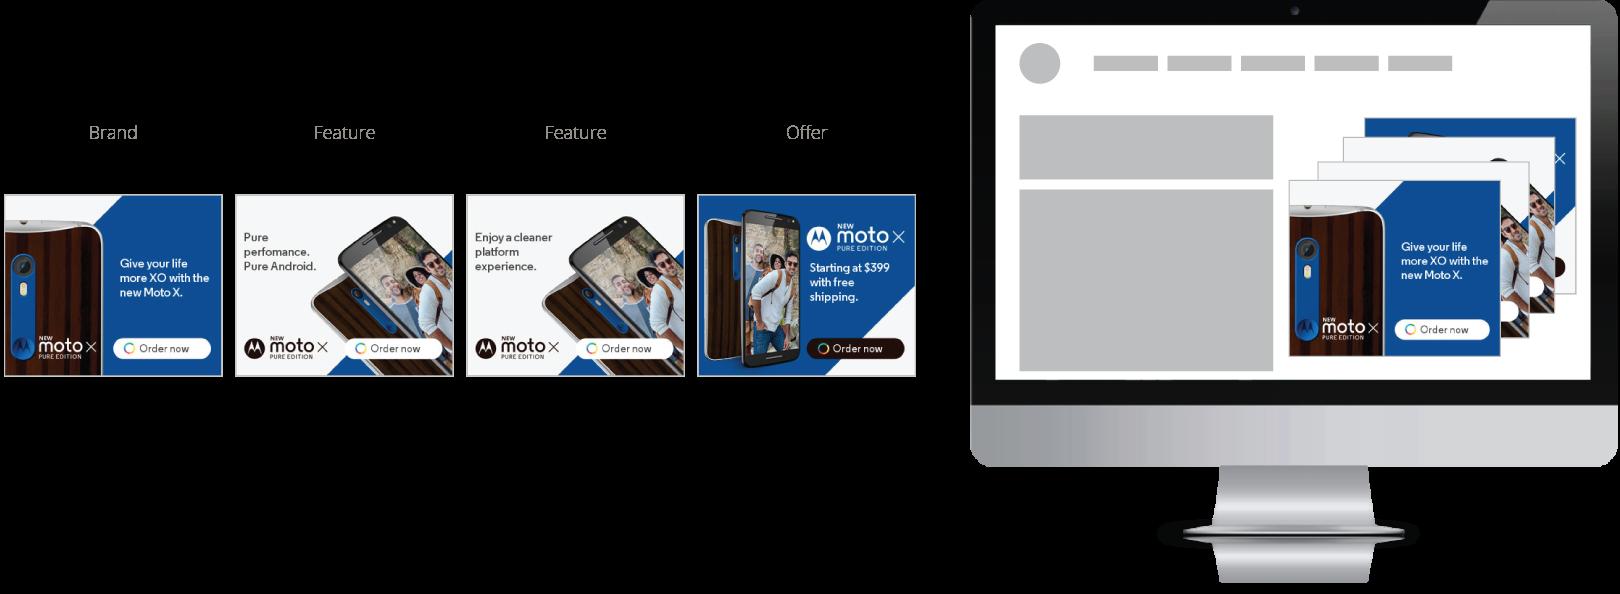 Motorola Dynamic Ad Examples